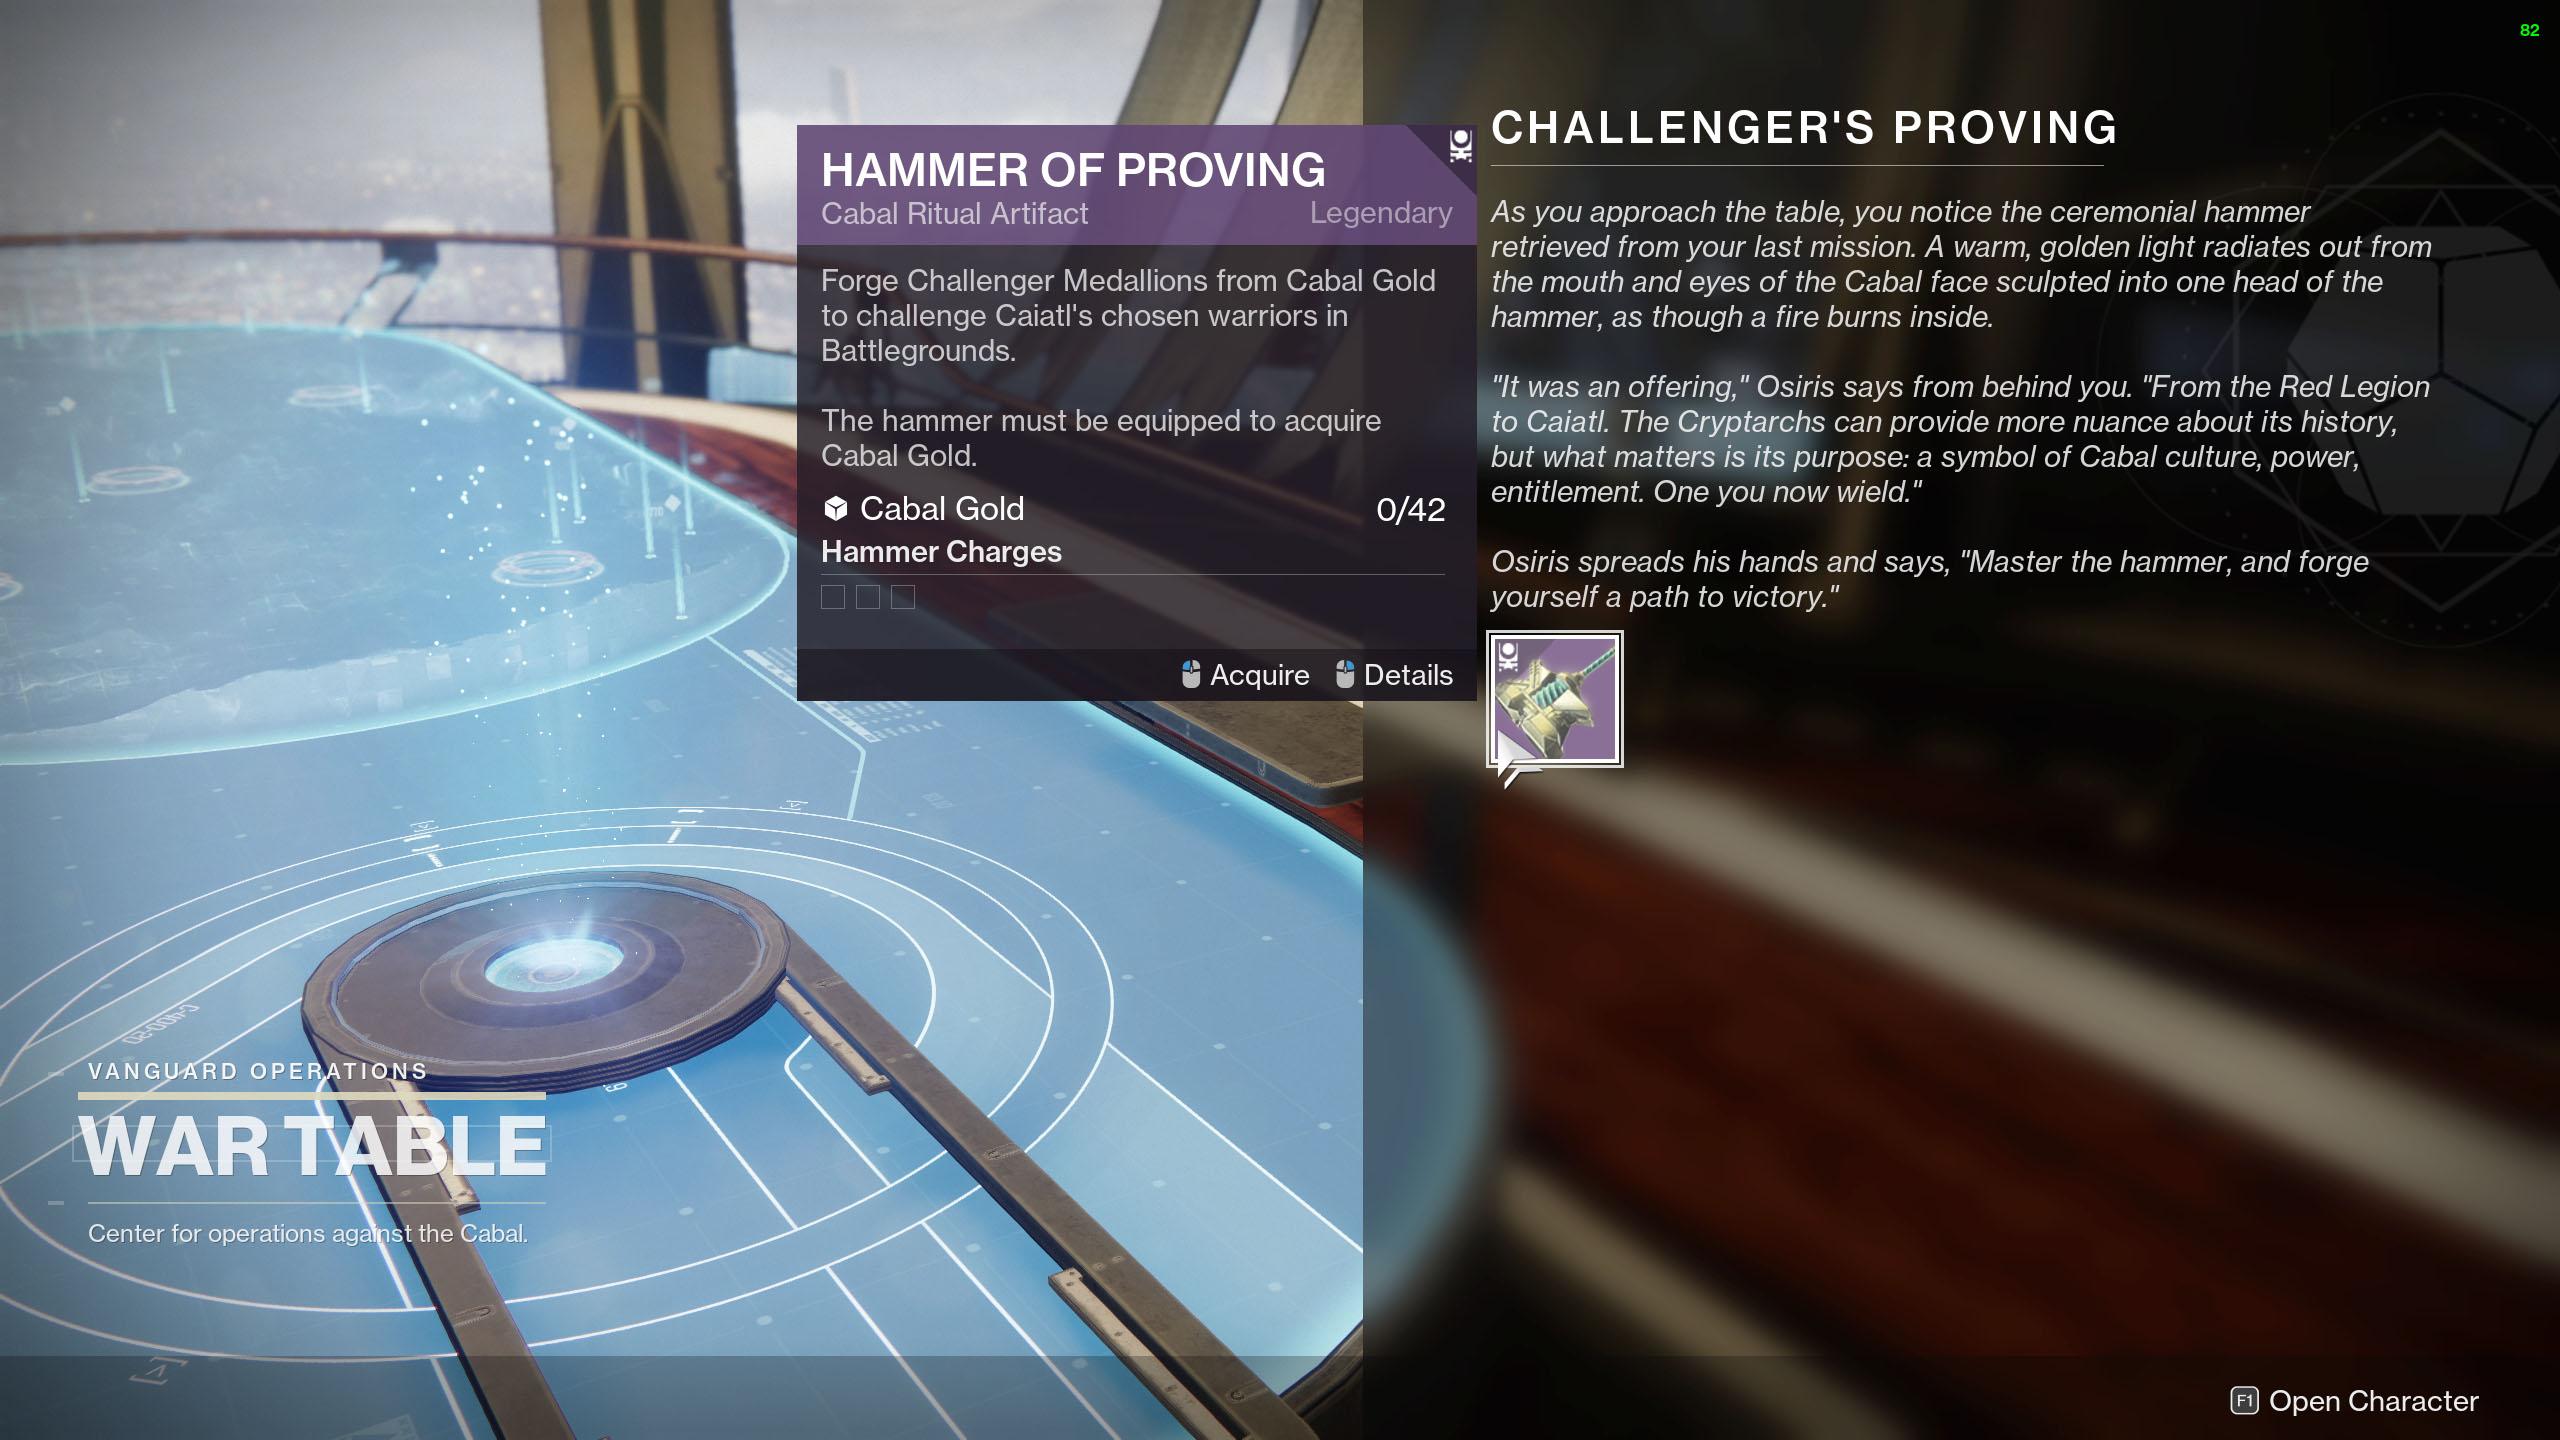 destiny 2 season of the chosen HELM Hammer of Proving